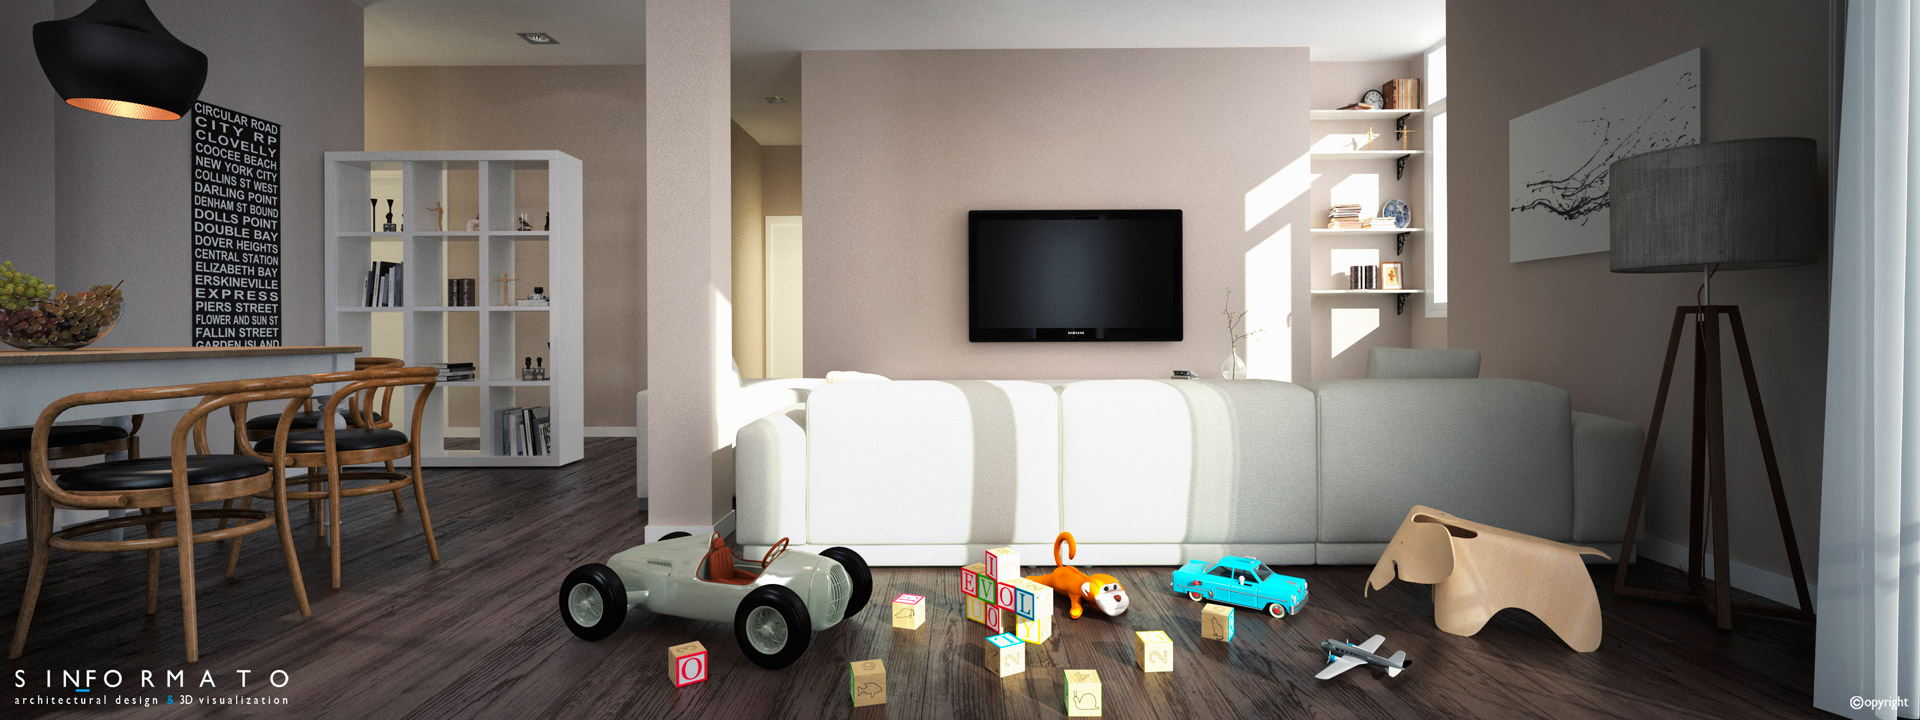 Interiorismo vivienda santander 360 sin formato - Forma interiorismo ...